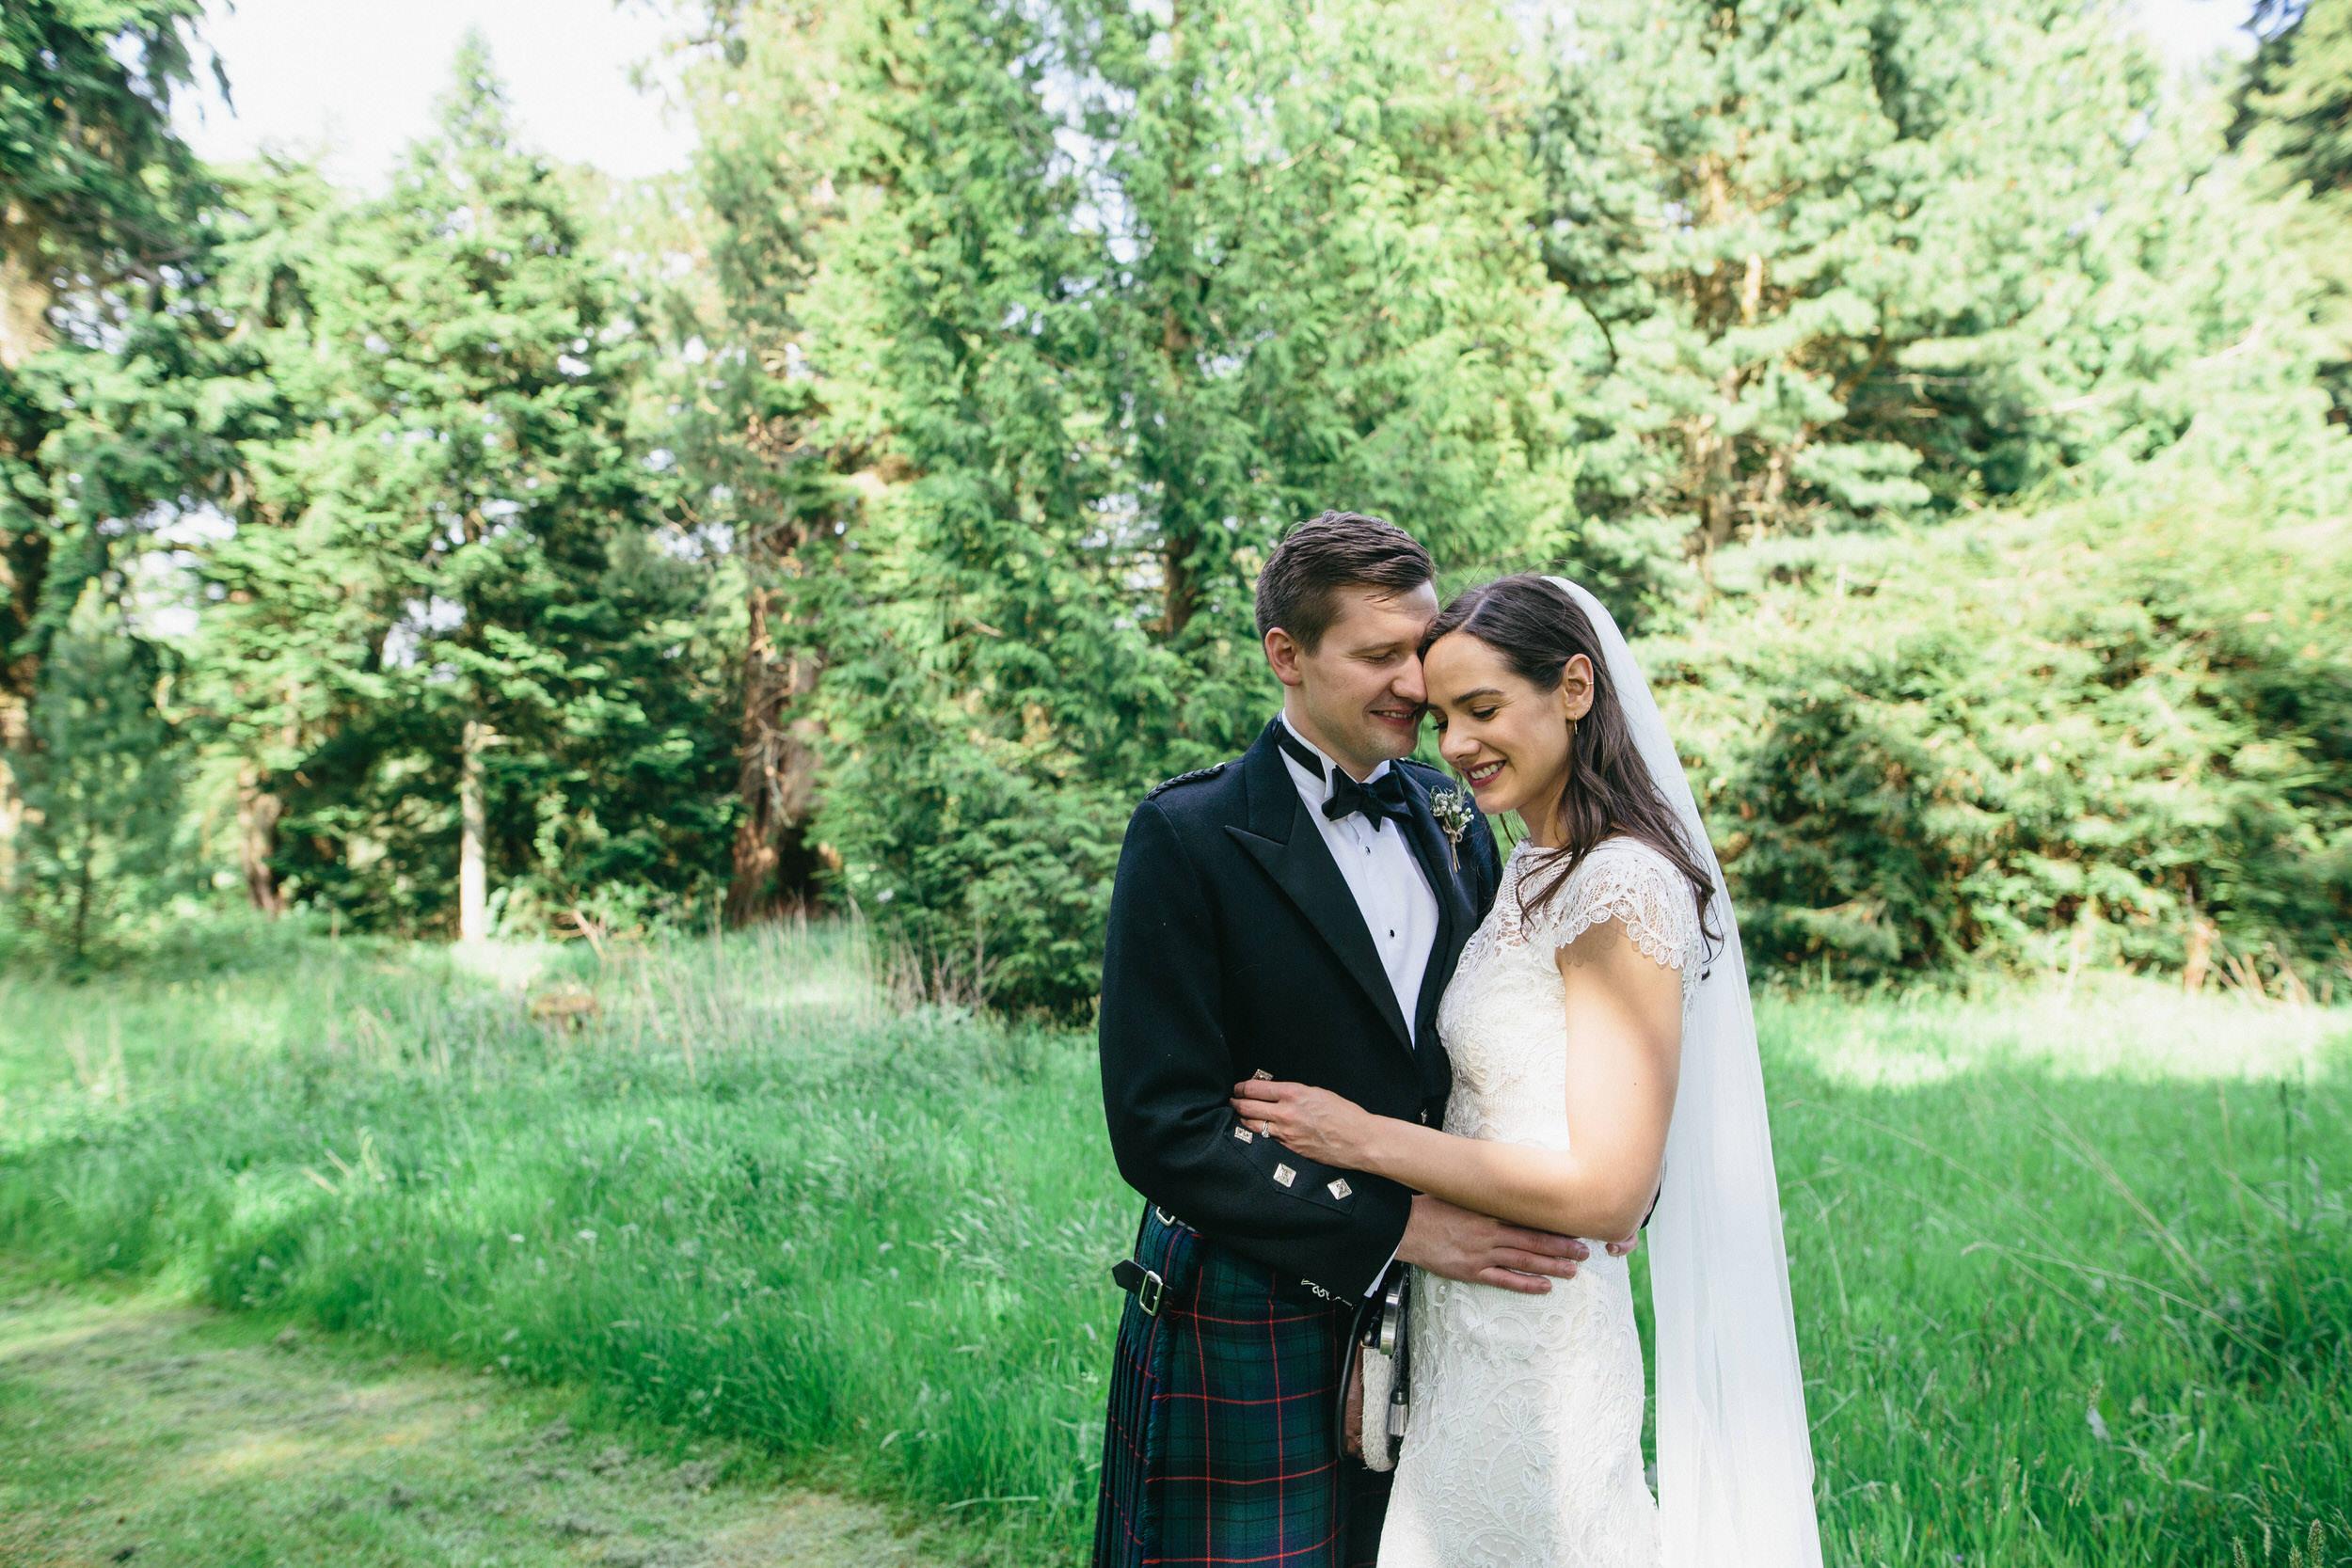 Quirky Wedding Photographer Scotland Glasgow Edinburgh Mirrorbox 153.jpg